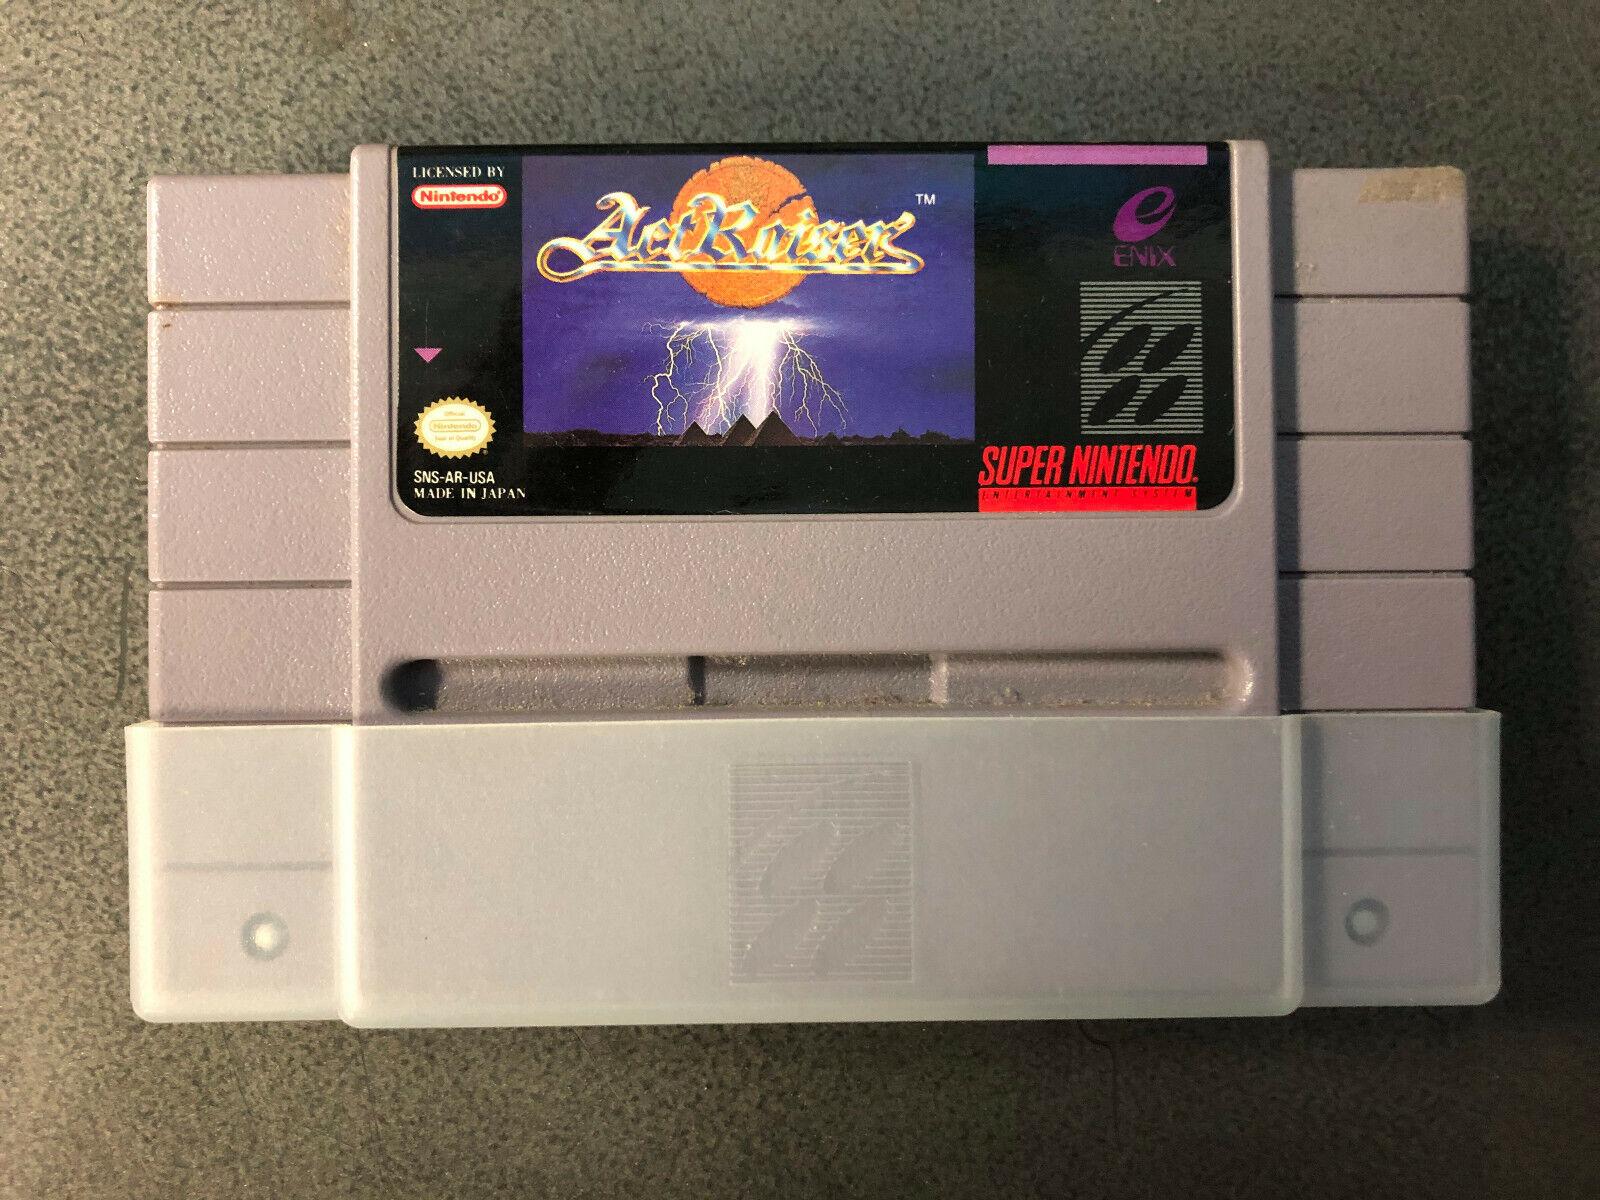 ActRaiser Super Nintendo Entertainment System SNES, 1991 Authentic RARE Tested - $96.00